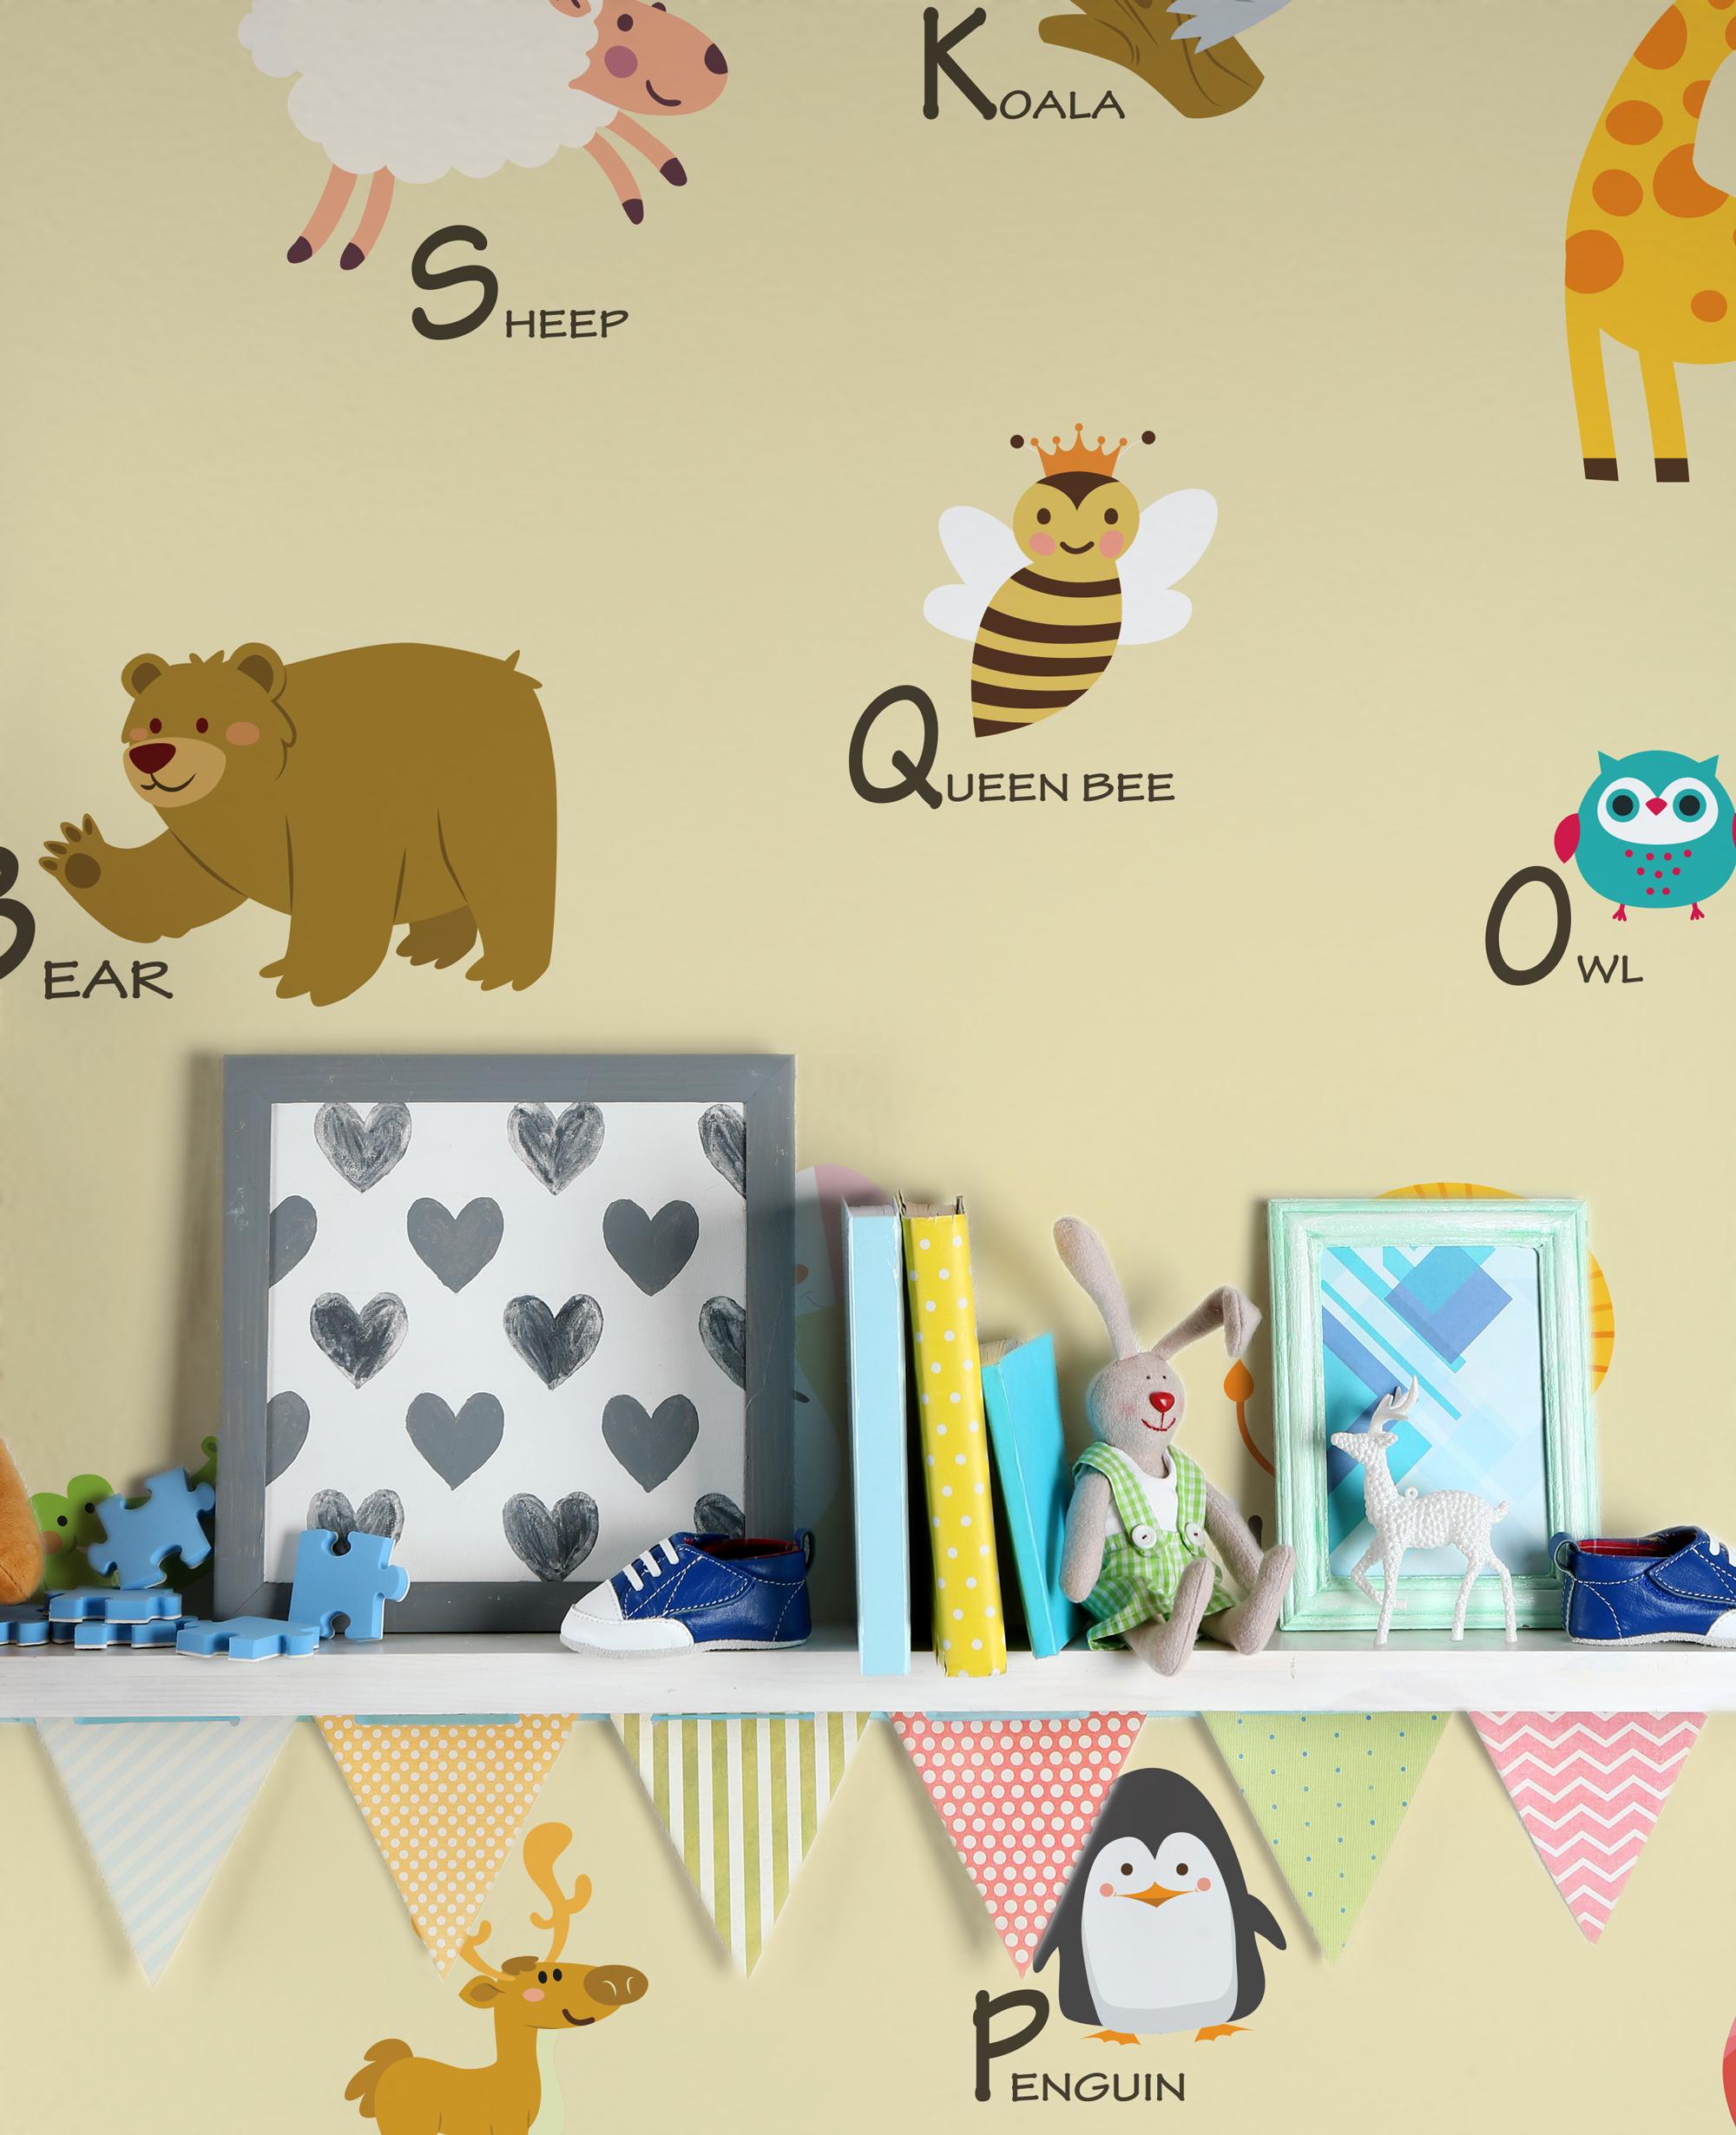 Carta Da Parati Bambini Texture.Alfabeto Inglese Beige Carta Da Parati Con Texture Telata 300 Gr